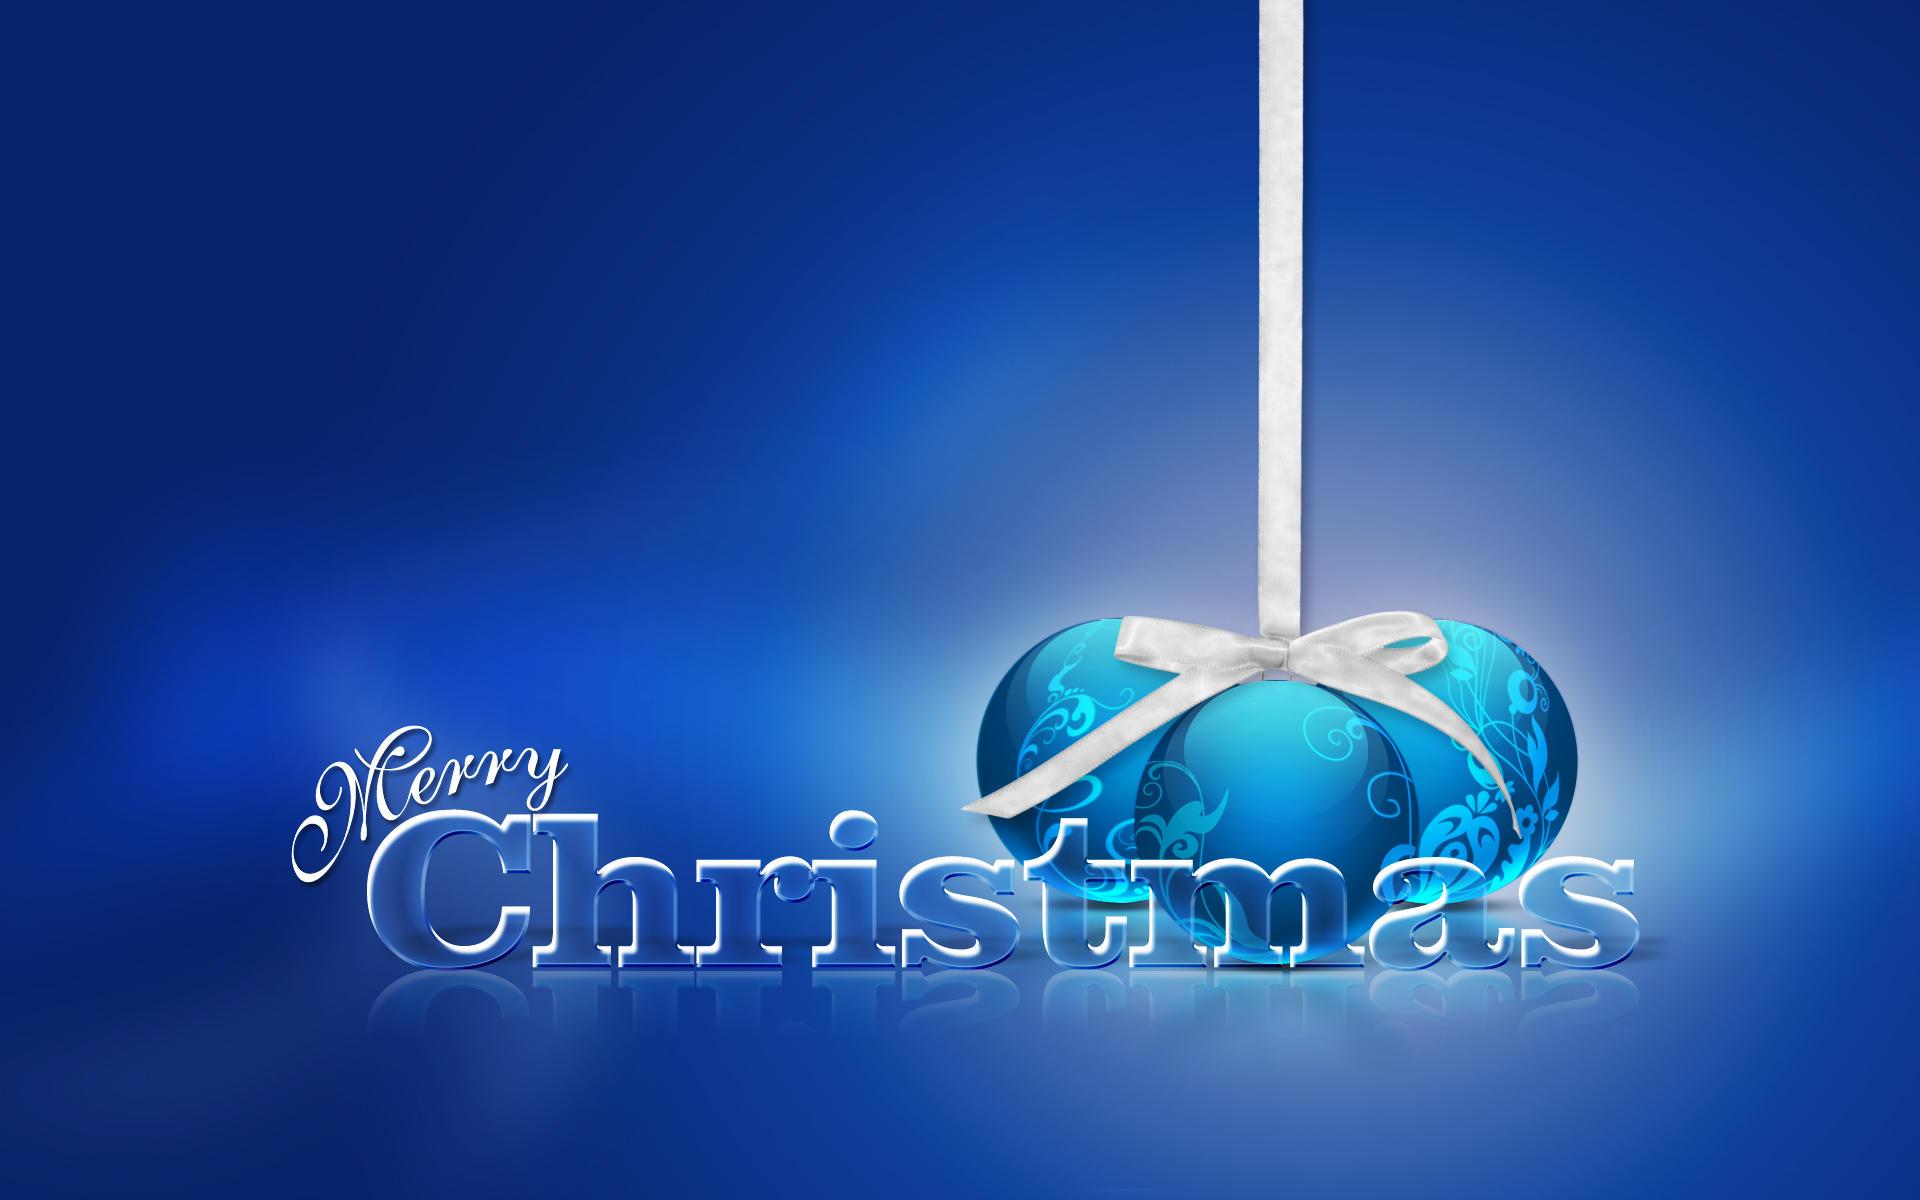 Merry Christmas 08 Widescreen by DigitalPhenom